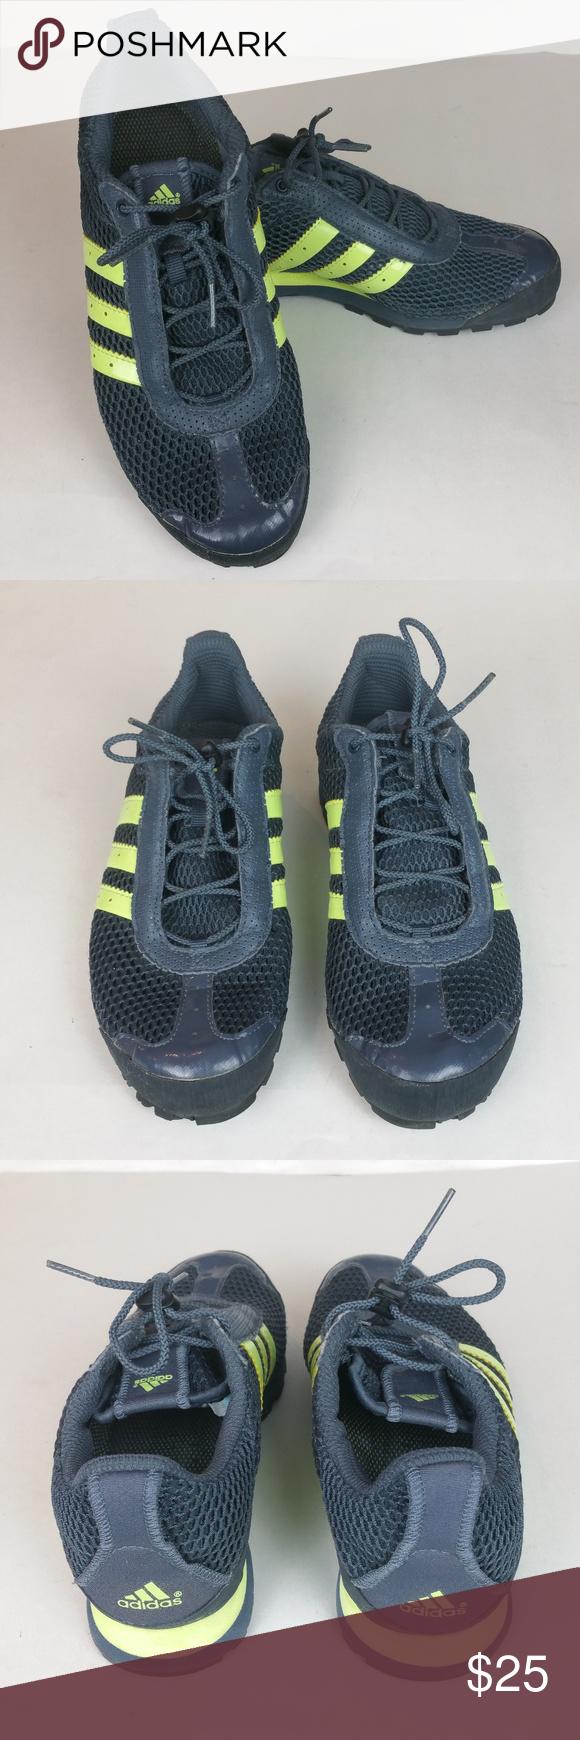 Wm Adidas Daroga Climacool Gray Adventure Sneakers | Adventure ...